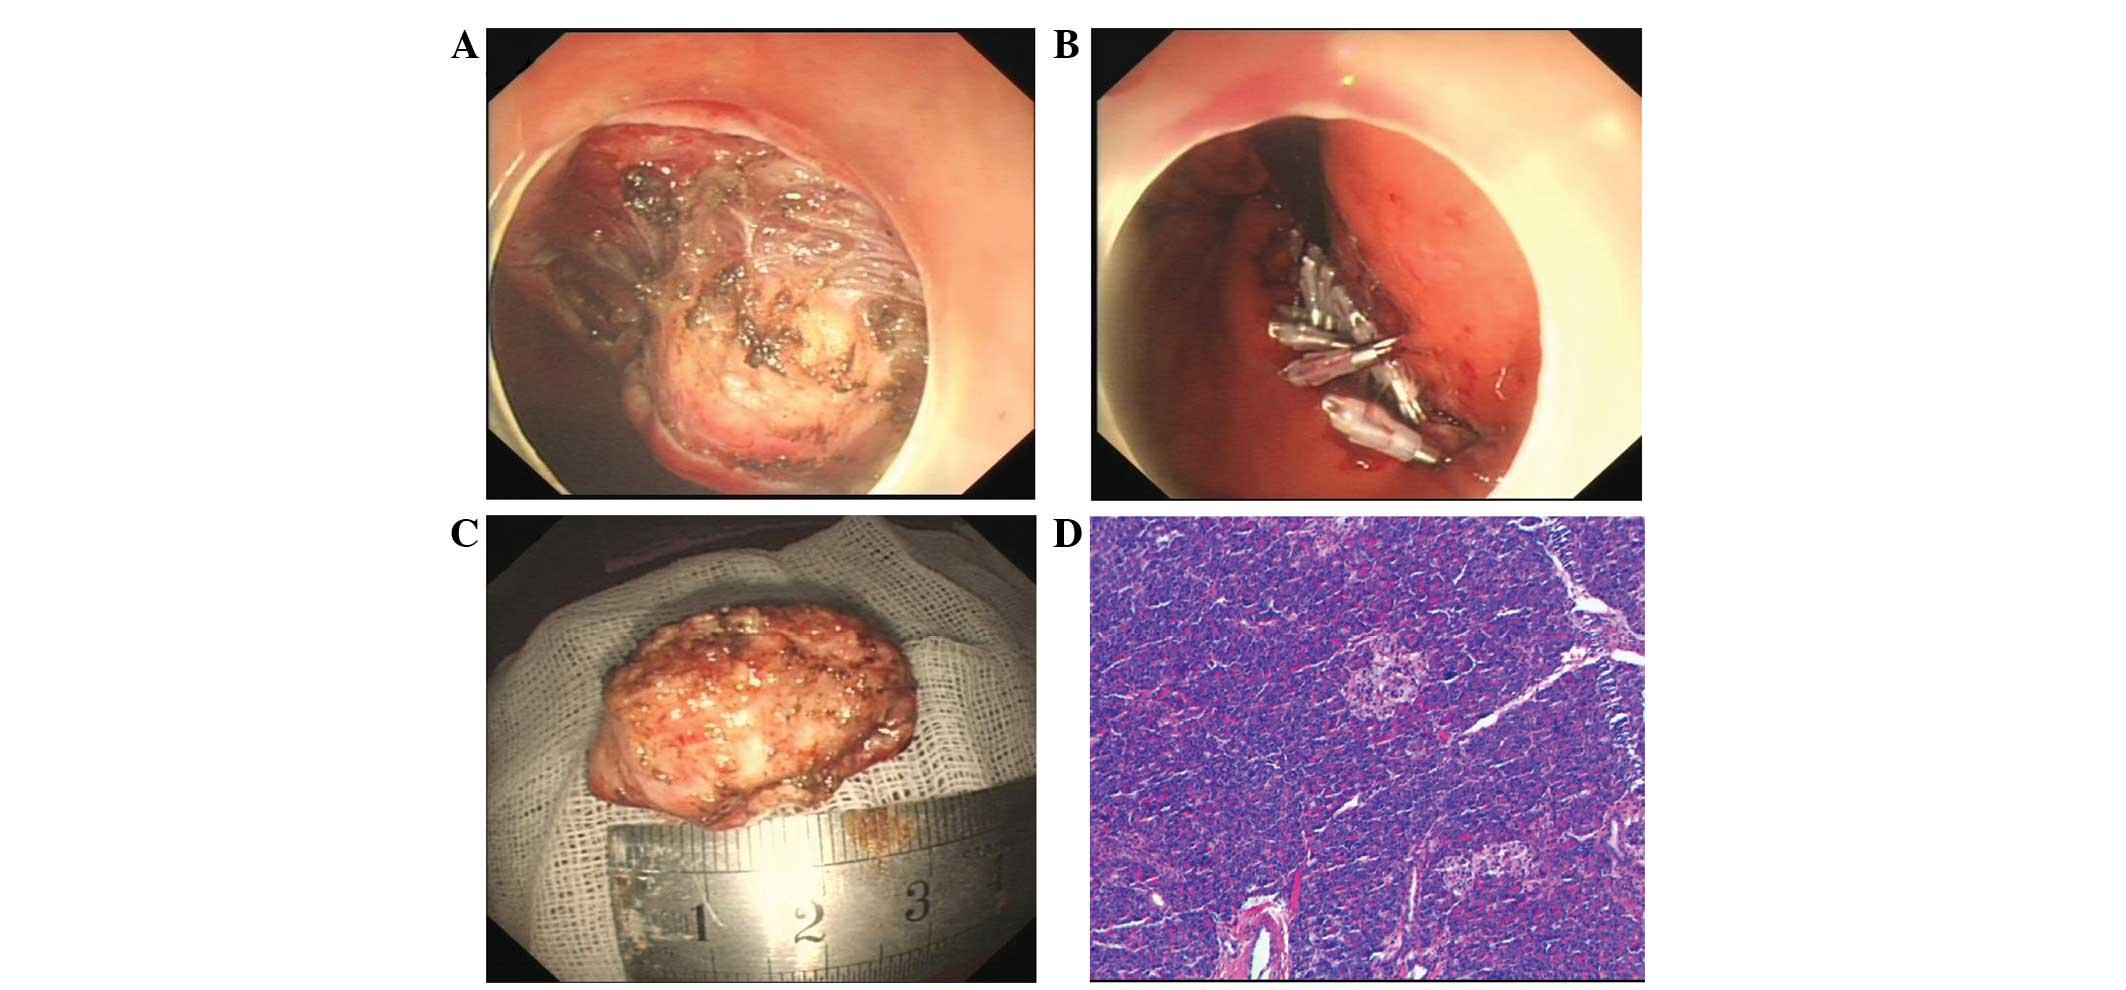 Gastric Heterotopic Pancreas Masquerading As A Stromal Tumor A Case